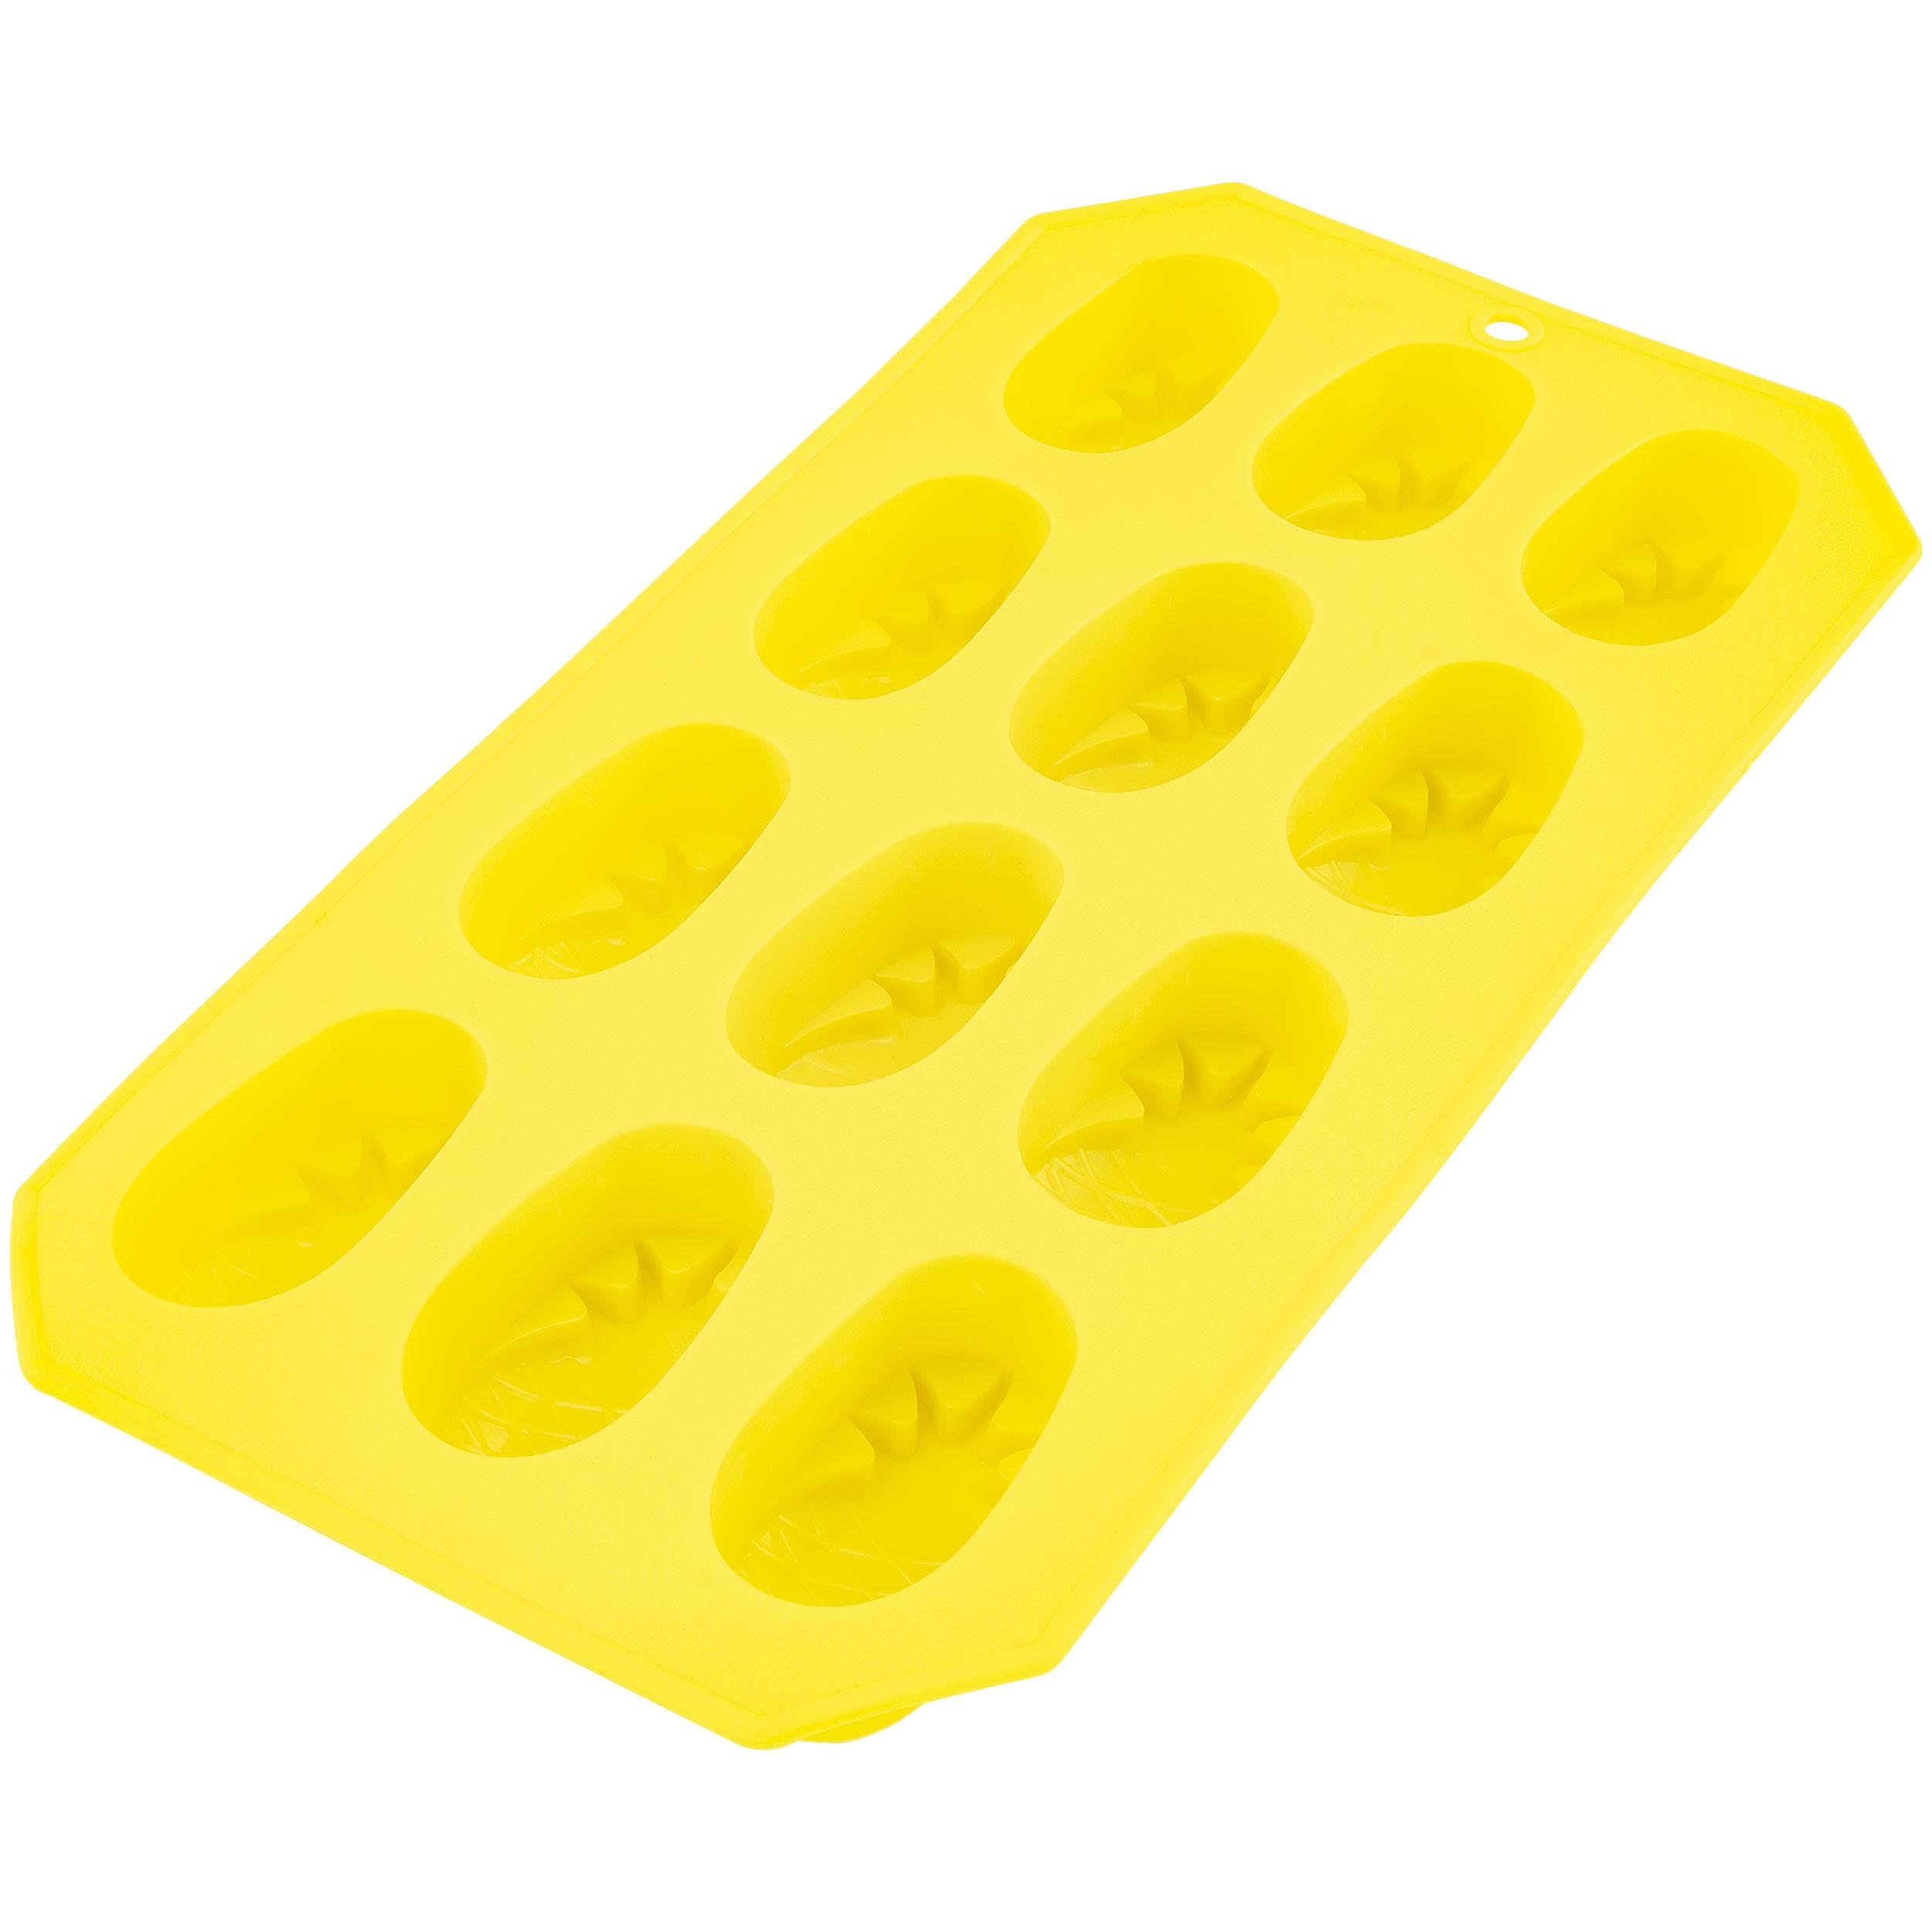 Pineapple Ice Cube Tray